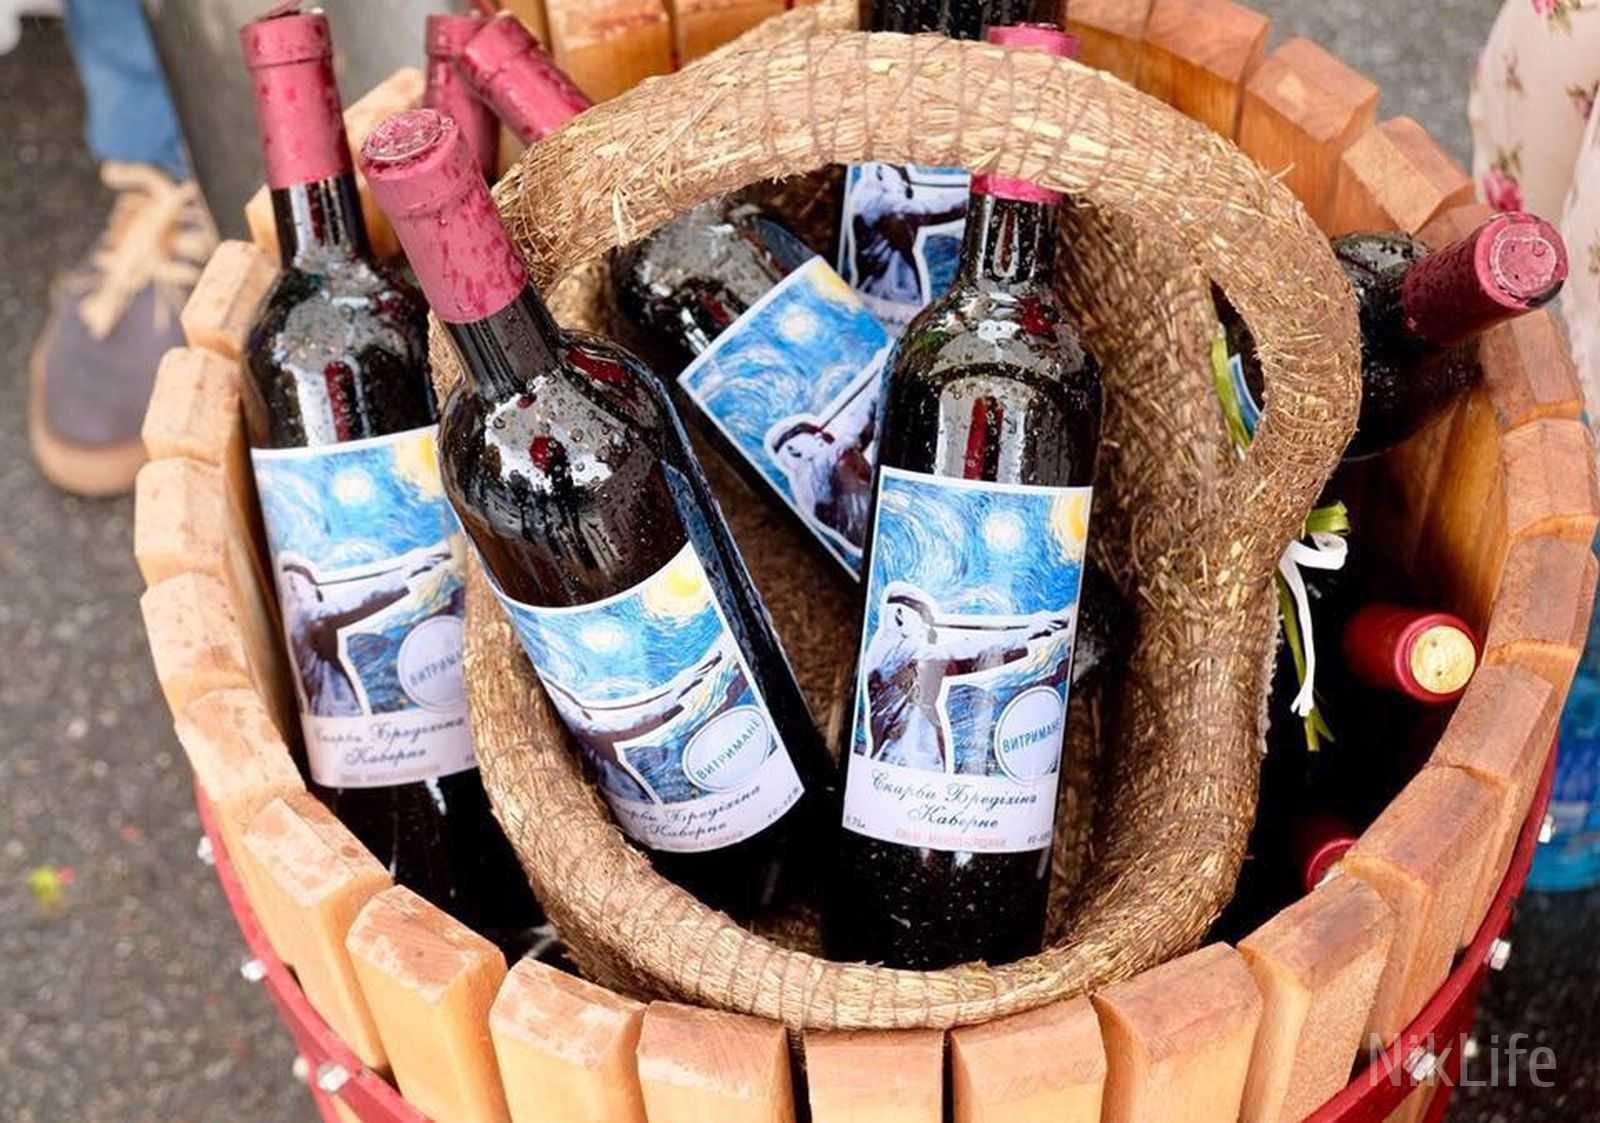 Slivino Village винодельня Сливино